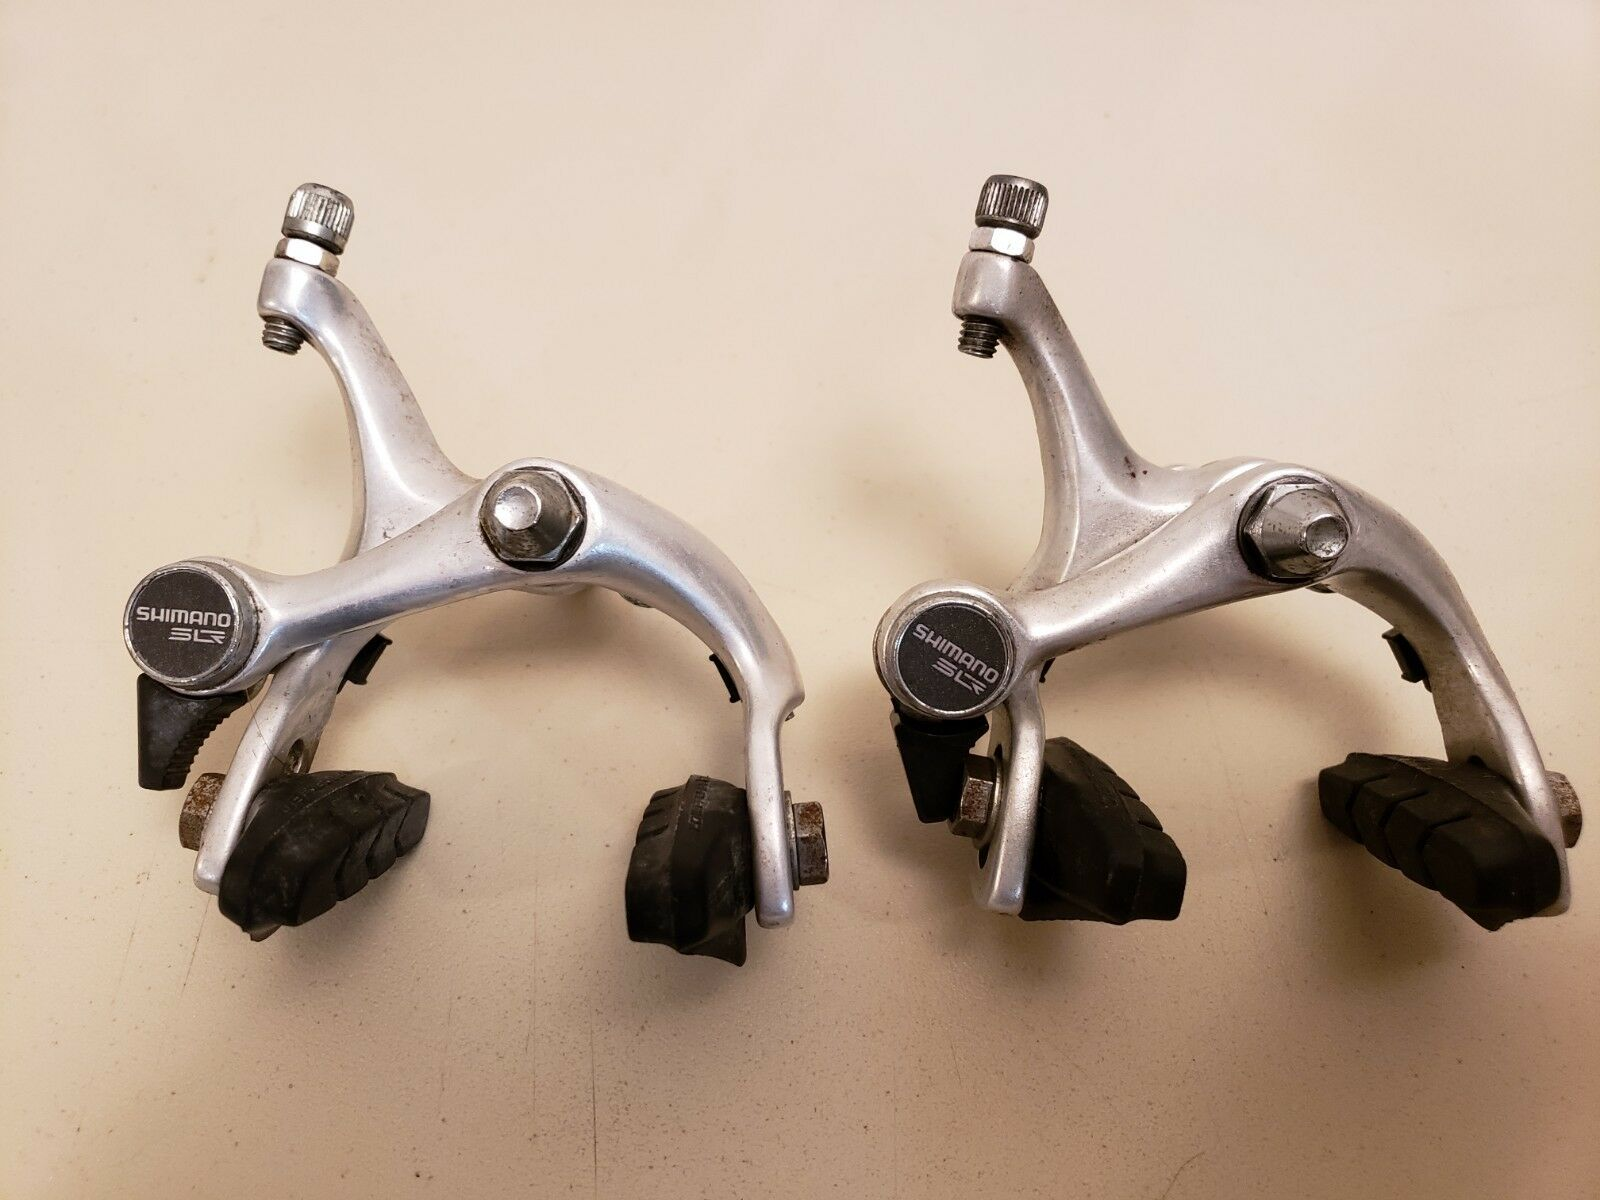 Vintage Shimano SLR Bicycle Brakes...BR-L490..Japan...Road Bike..39mm to 49mm